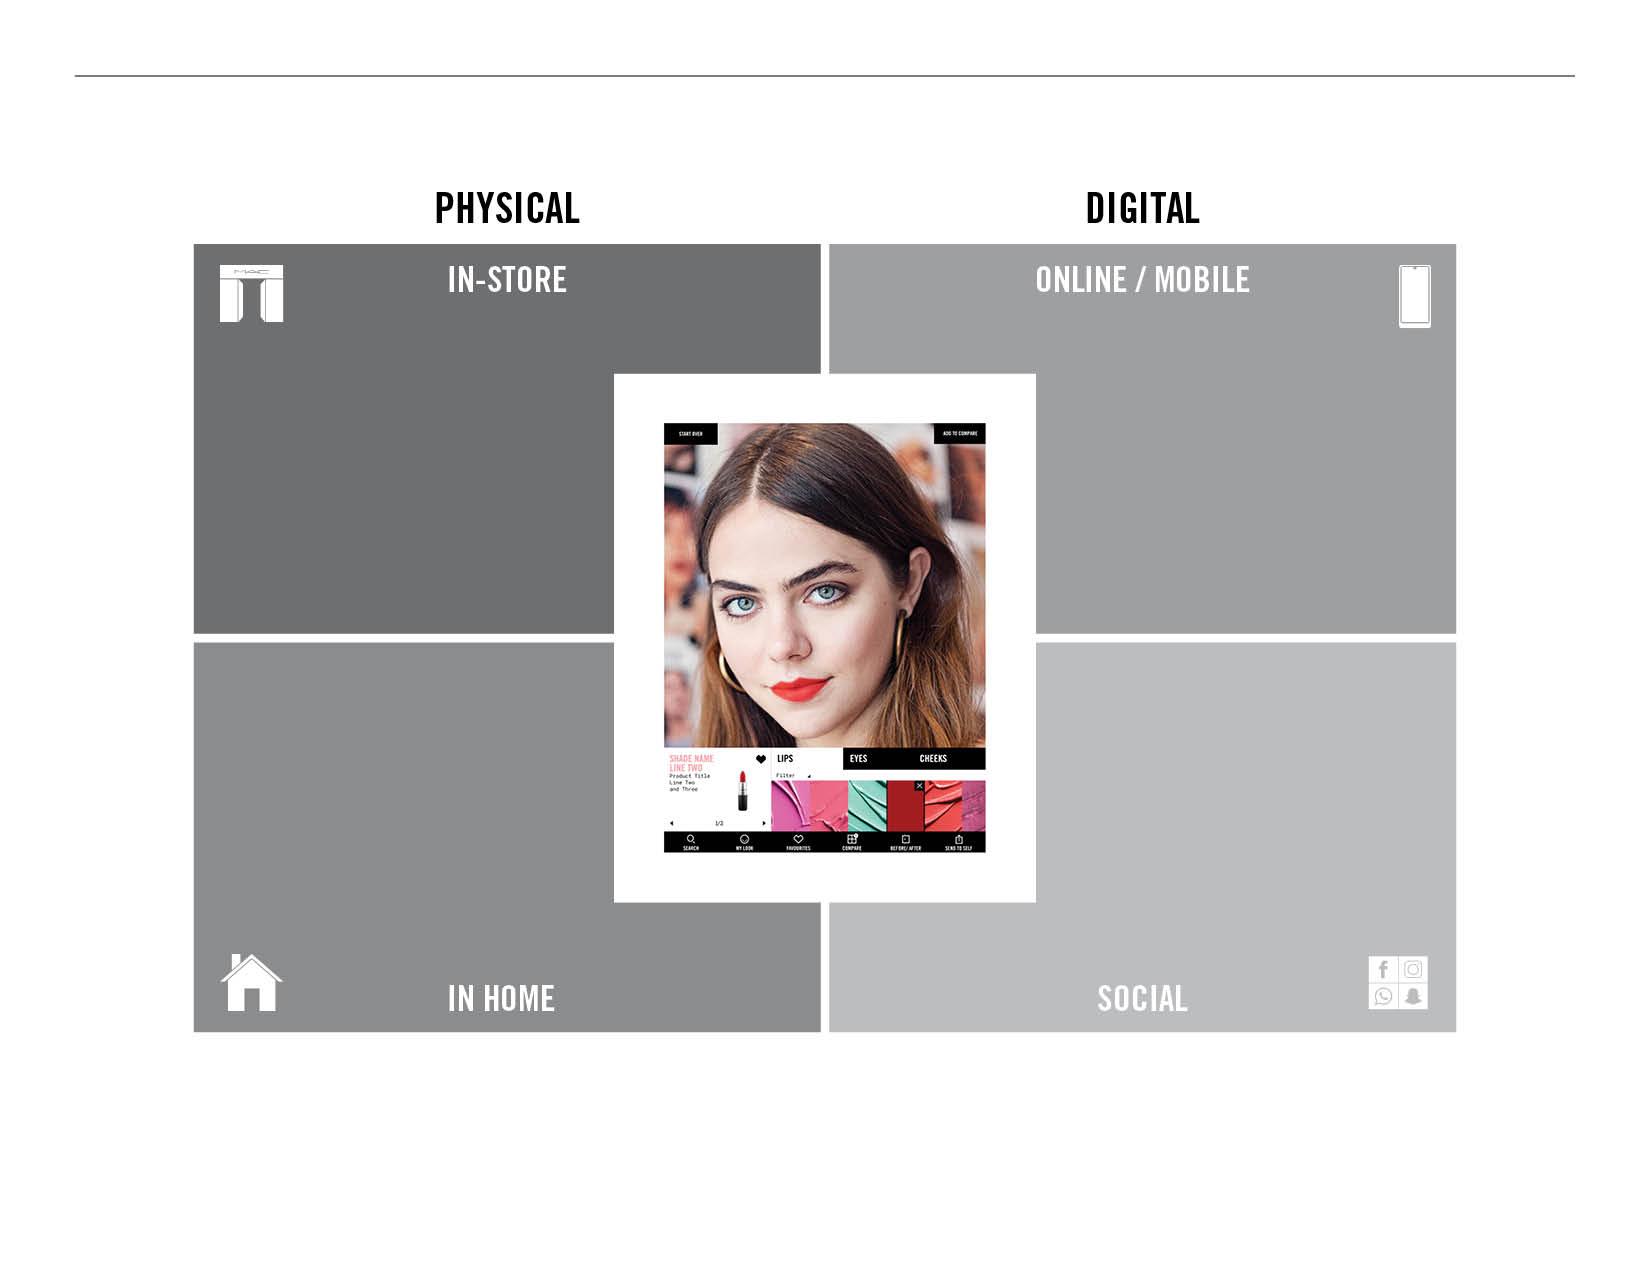 the_wieland_initiative_mac_cosmetics_ar_mirror_whats_next_2018_01_104.jpg